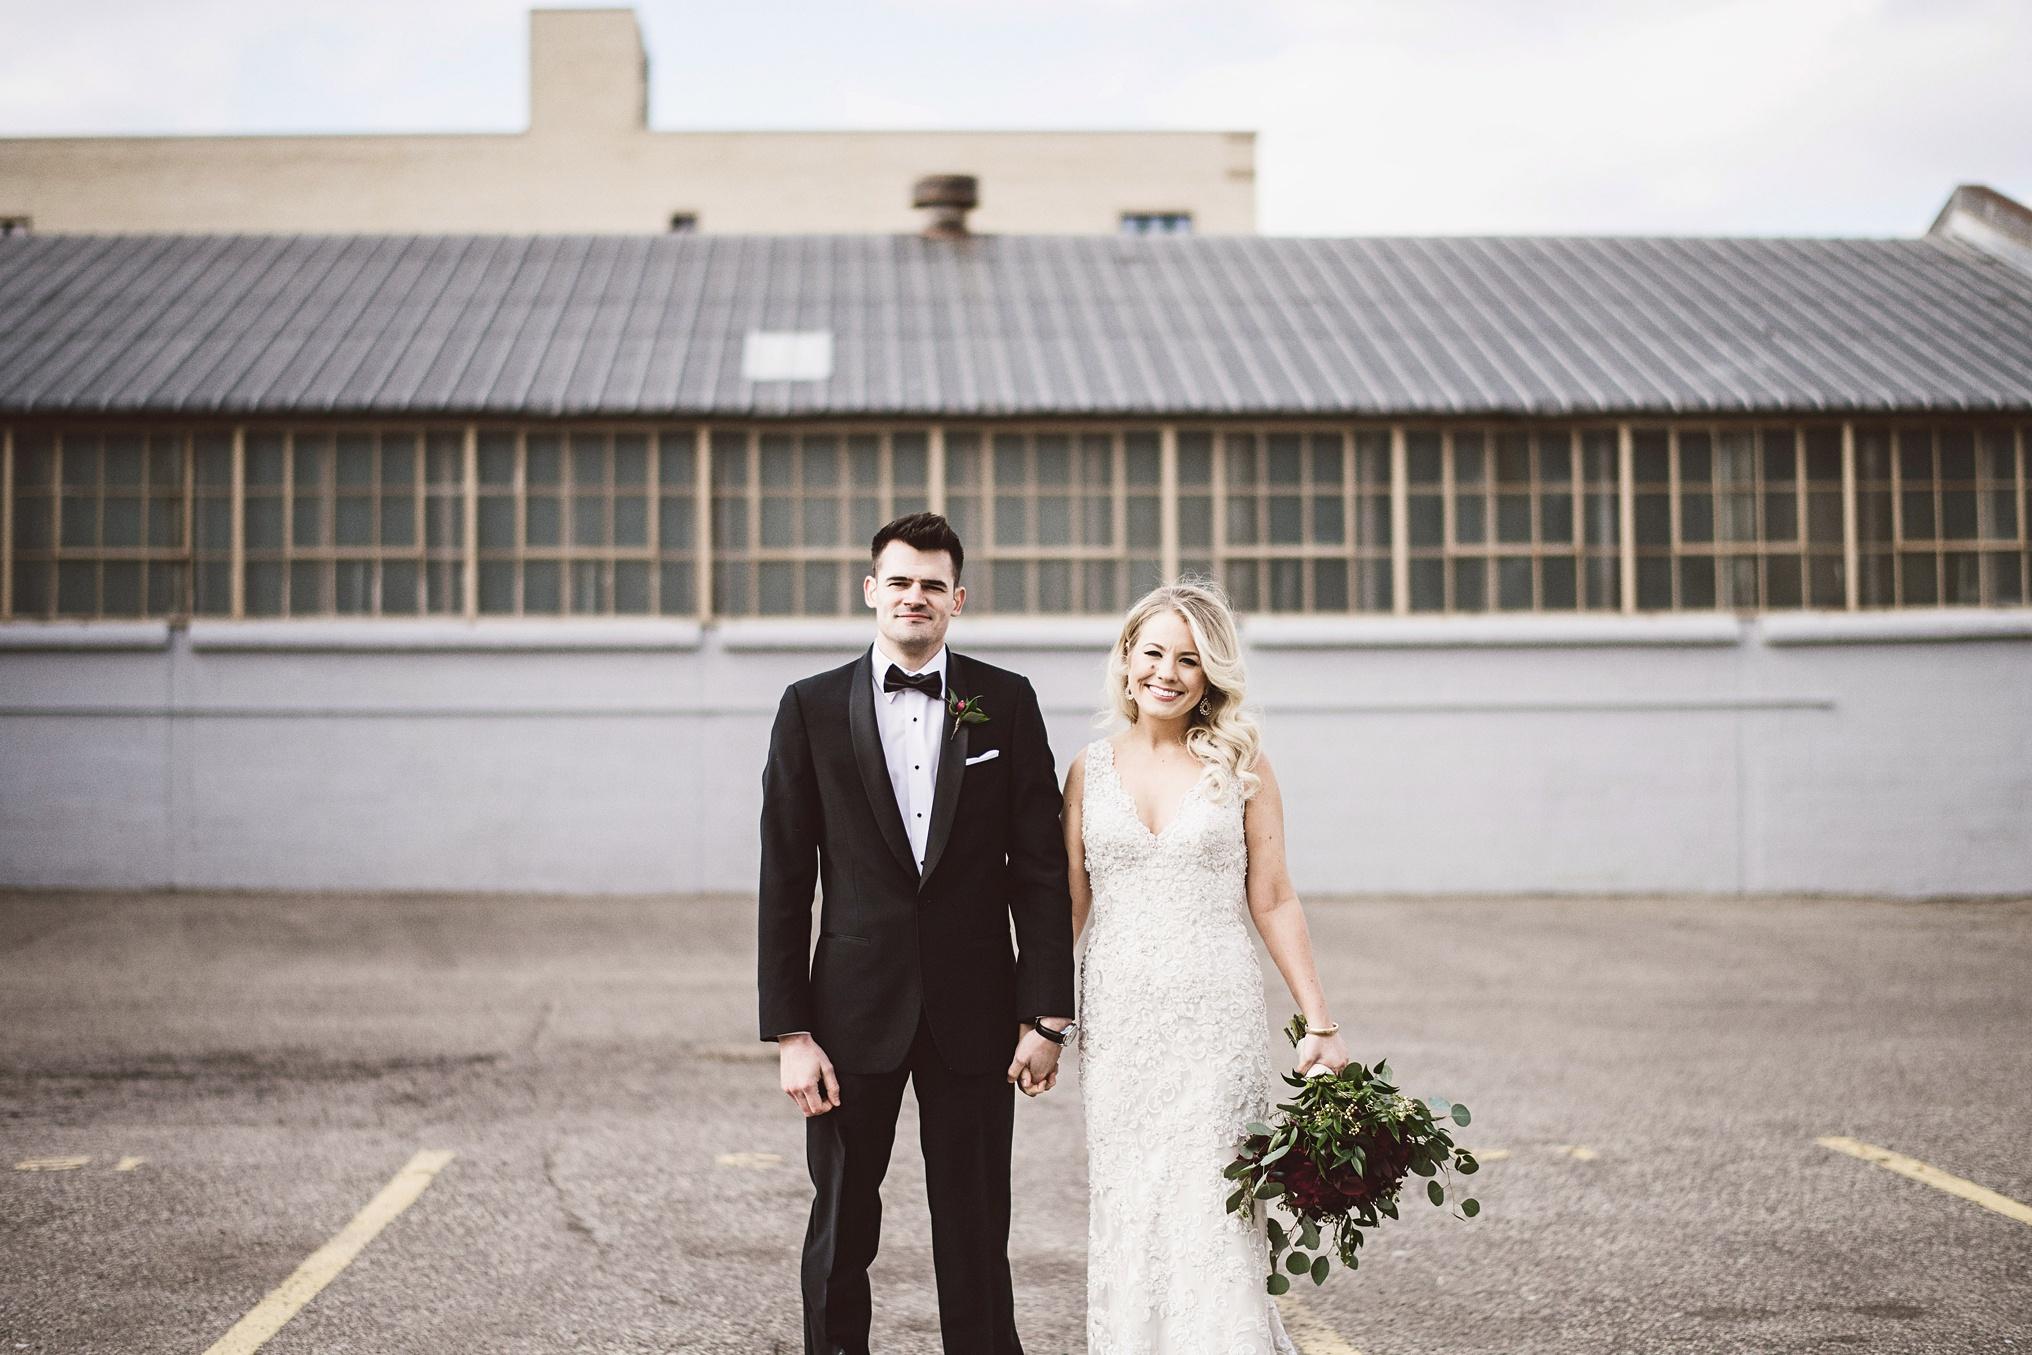 best_wedding_photography_2017_by_lucas_botz_photography_144.jpg